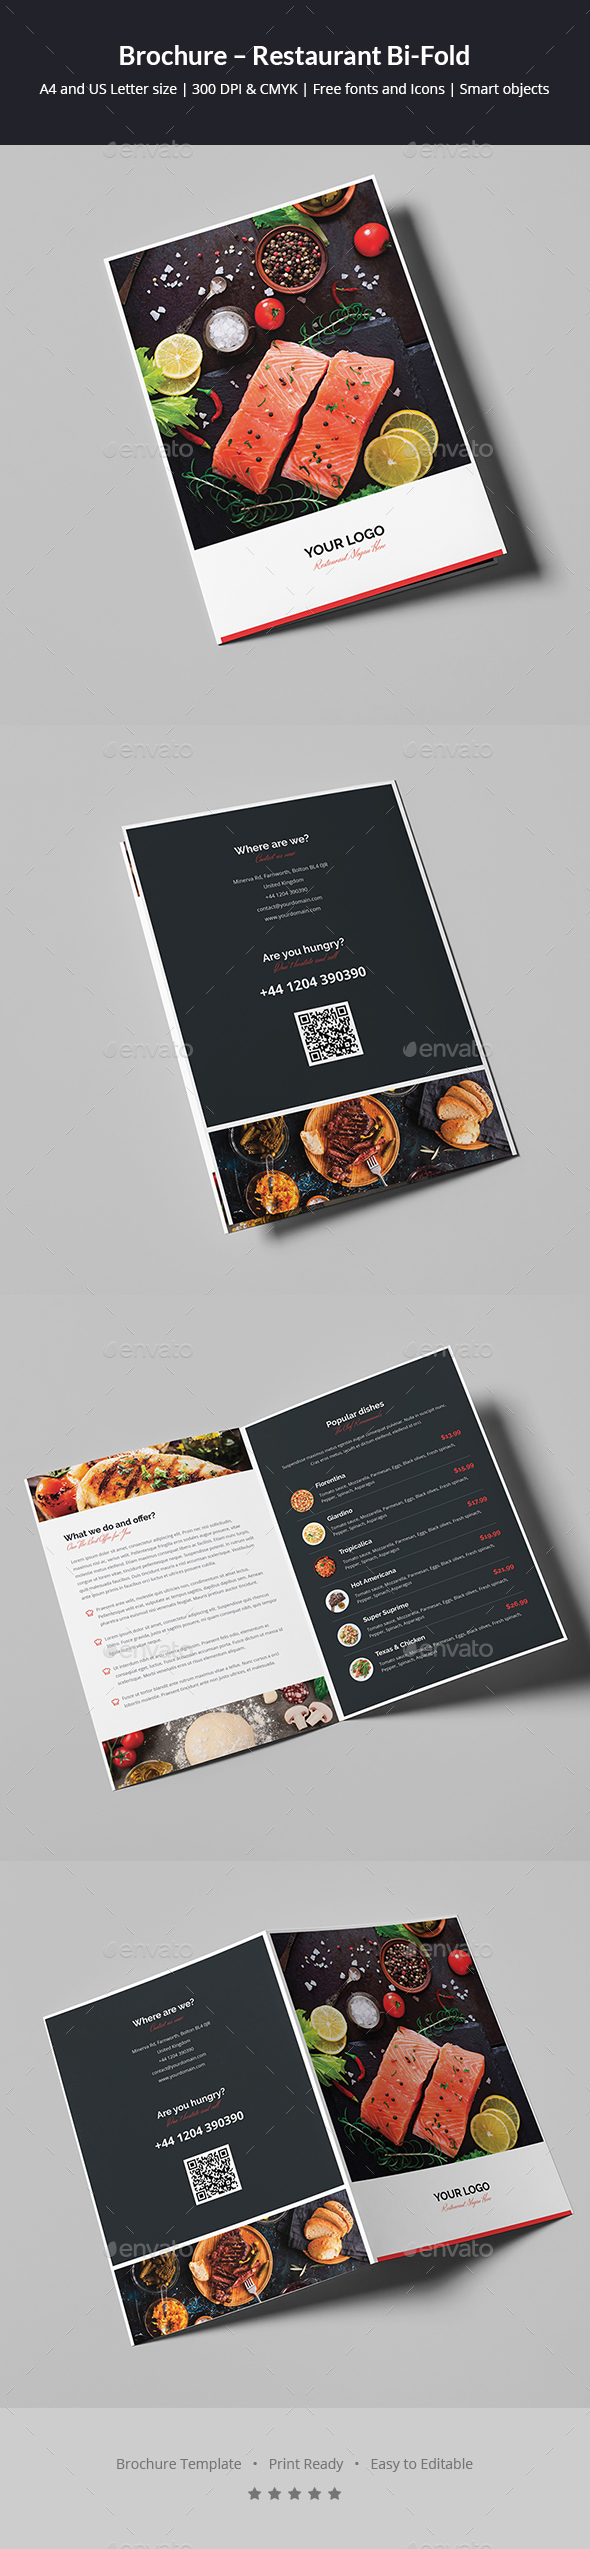 GraphicRiver Brochure Restaurant Bi-Fold 20337258